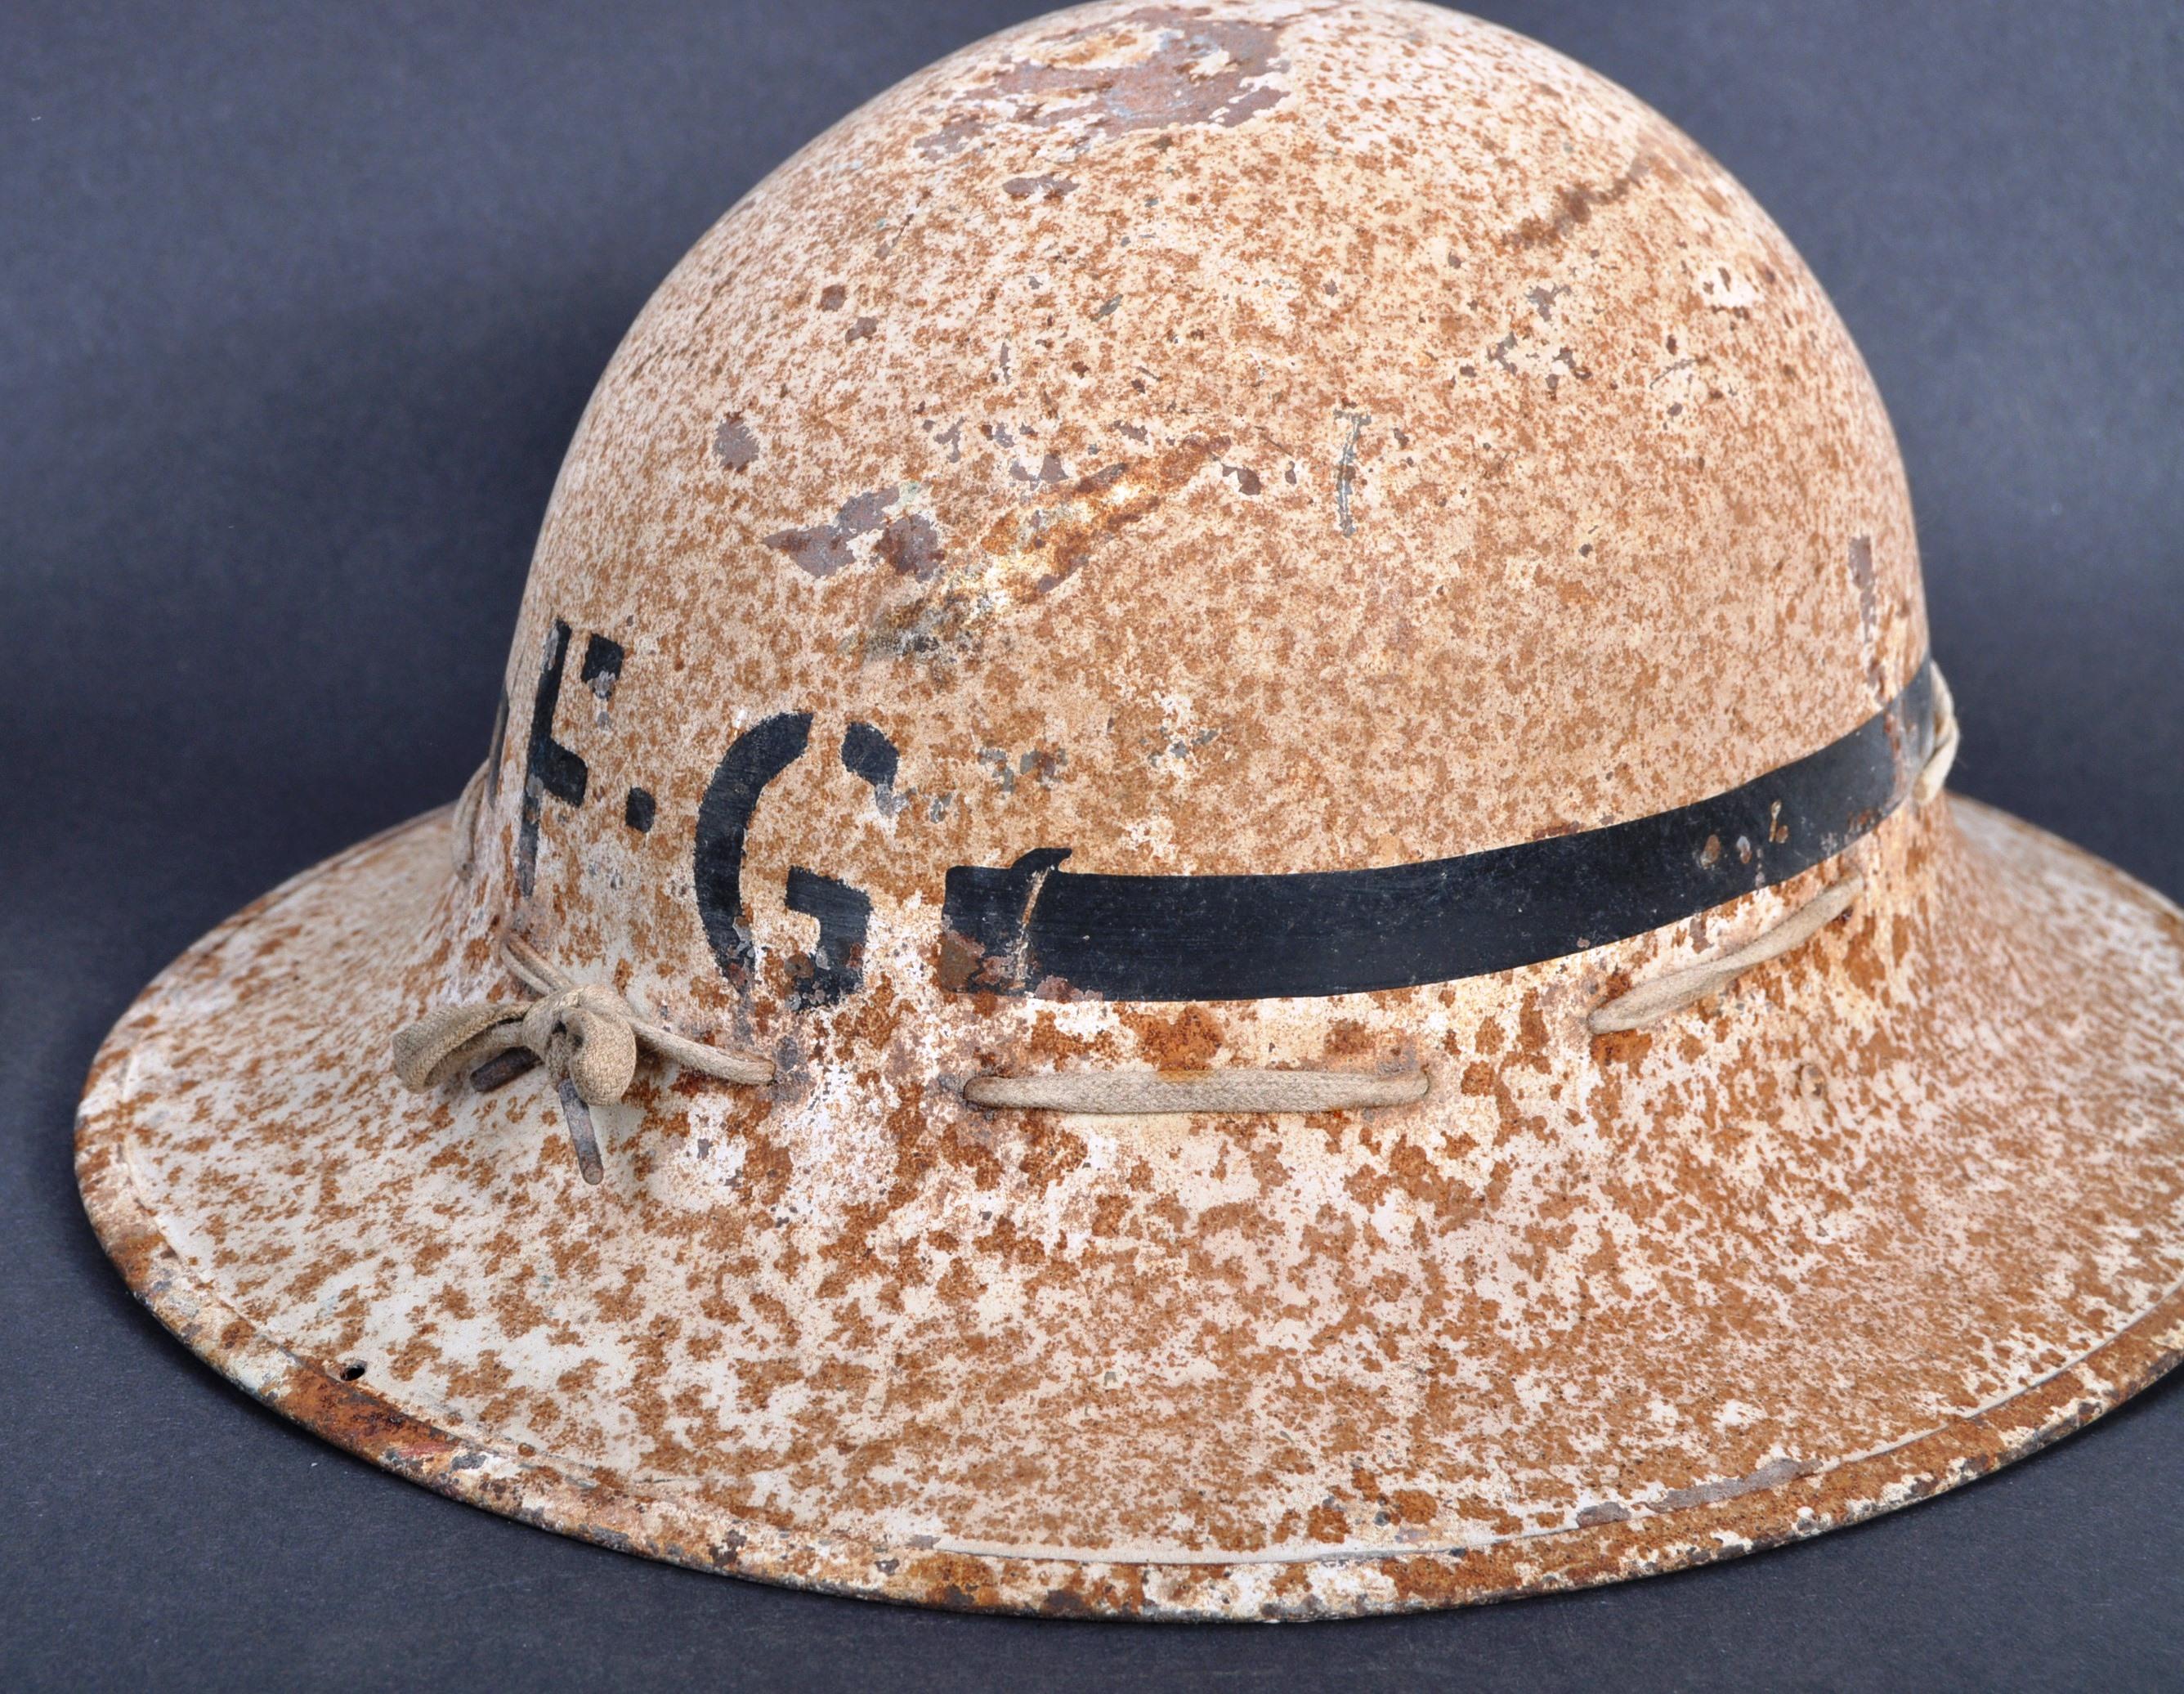 TWO ORIGINAL WWII SECOND WORLD WAR BRITISH COMBAT HELMETS - Image 3 of 7